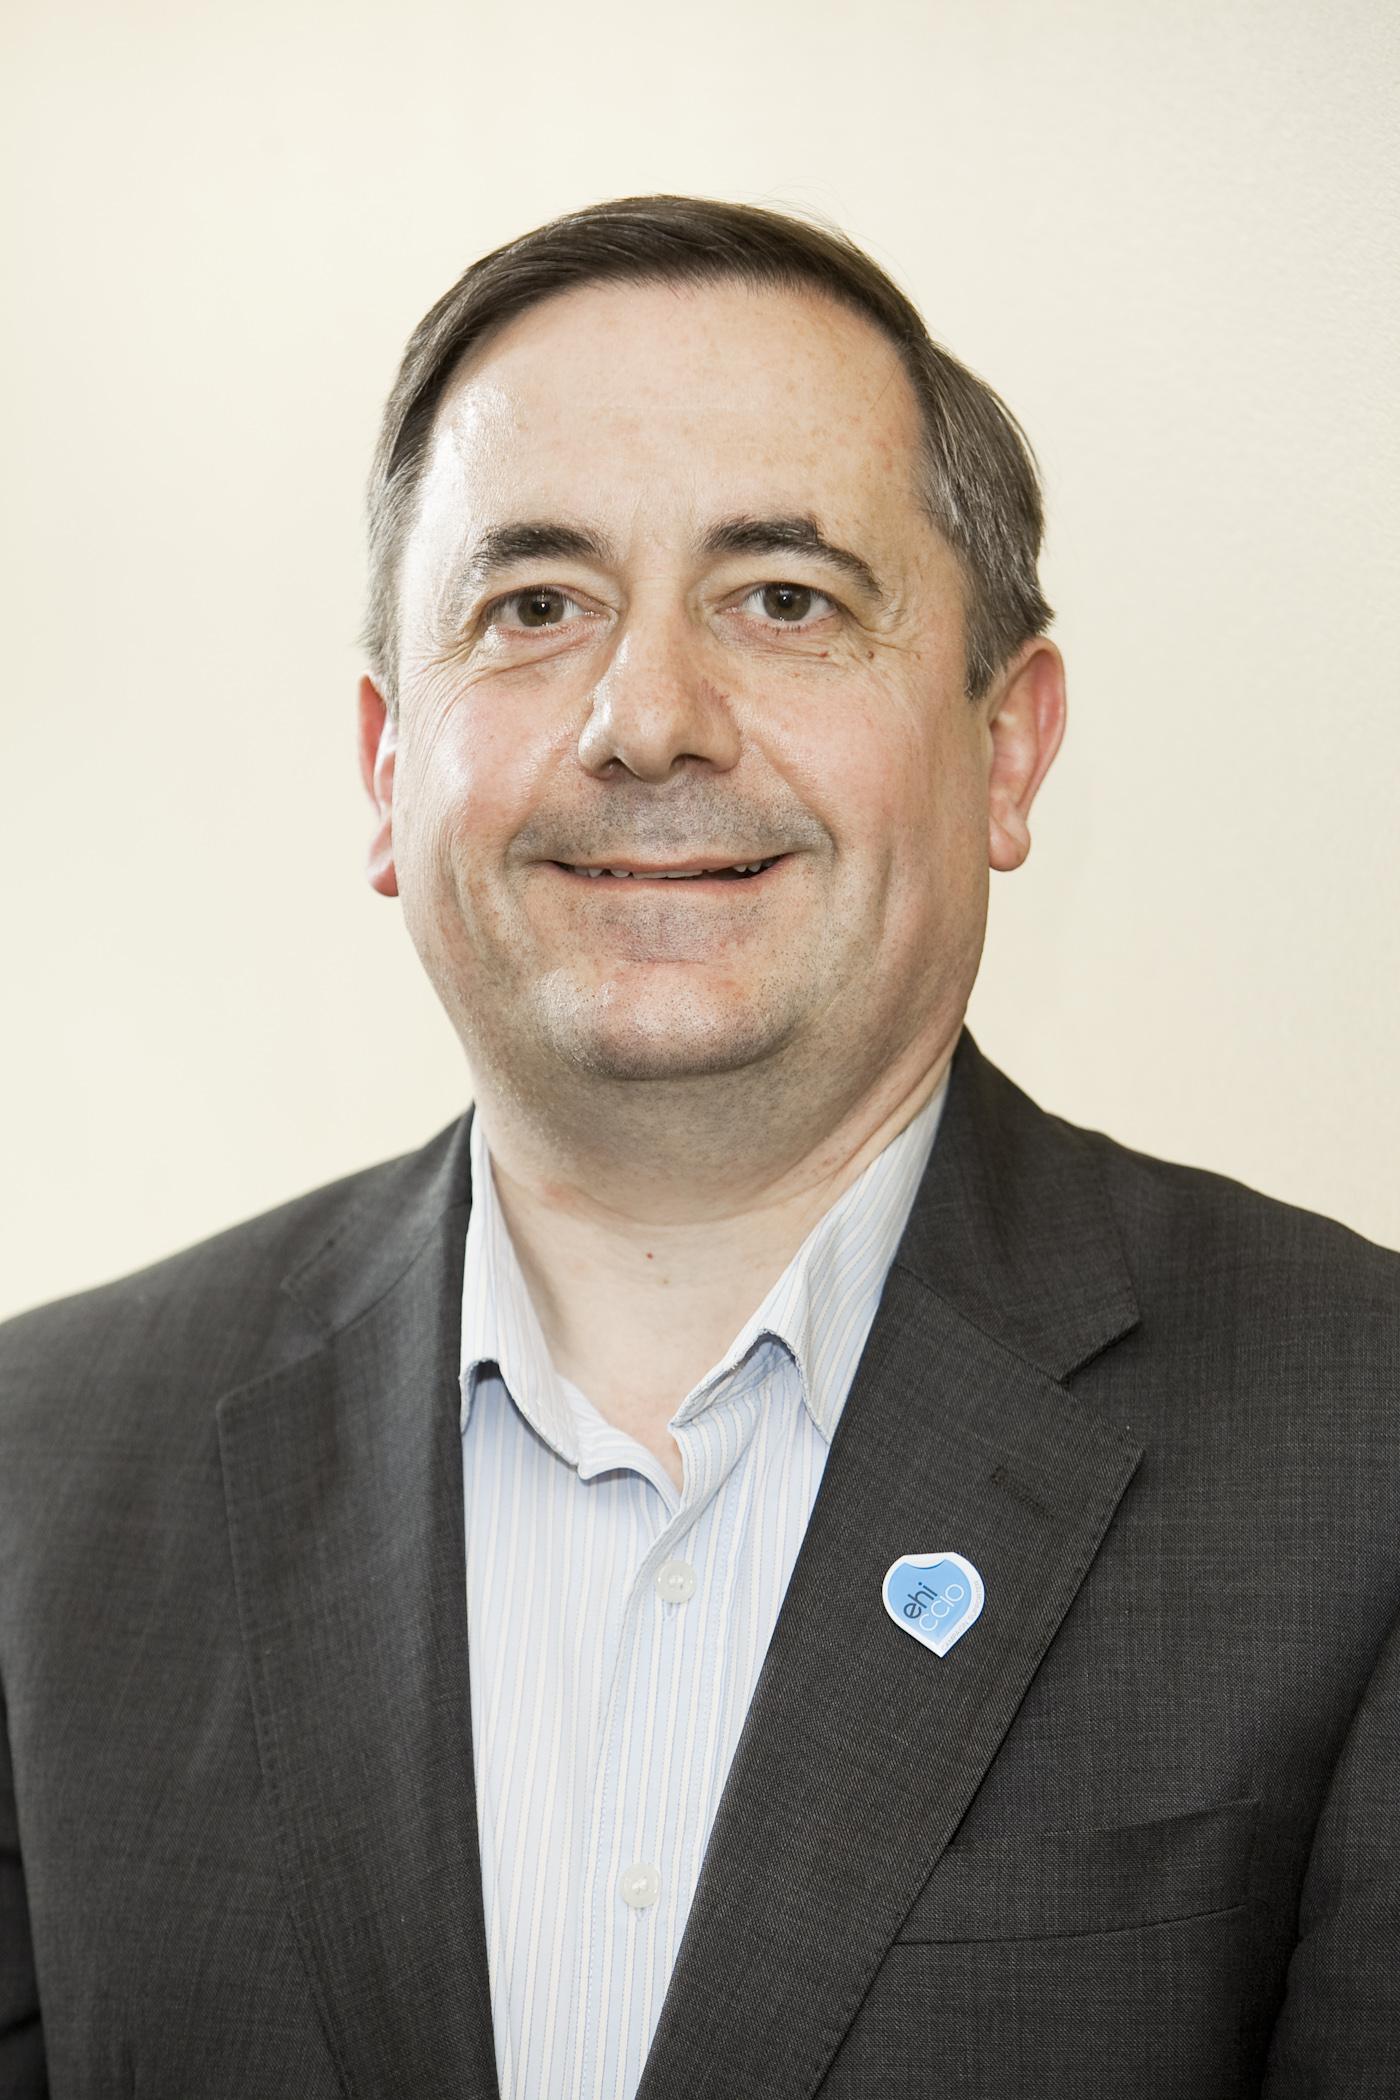 Phil Koczan